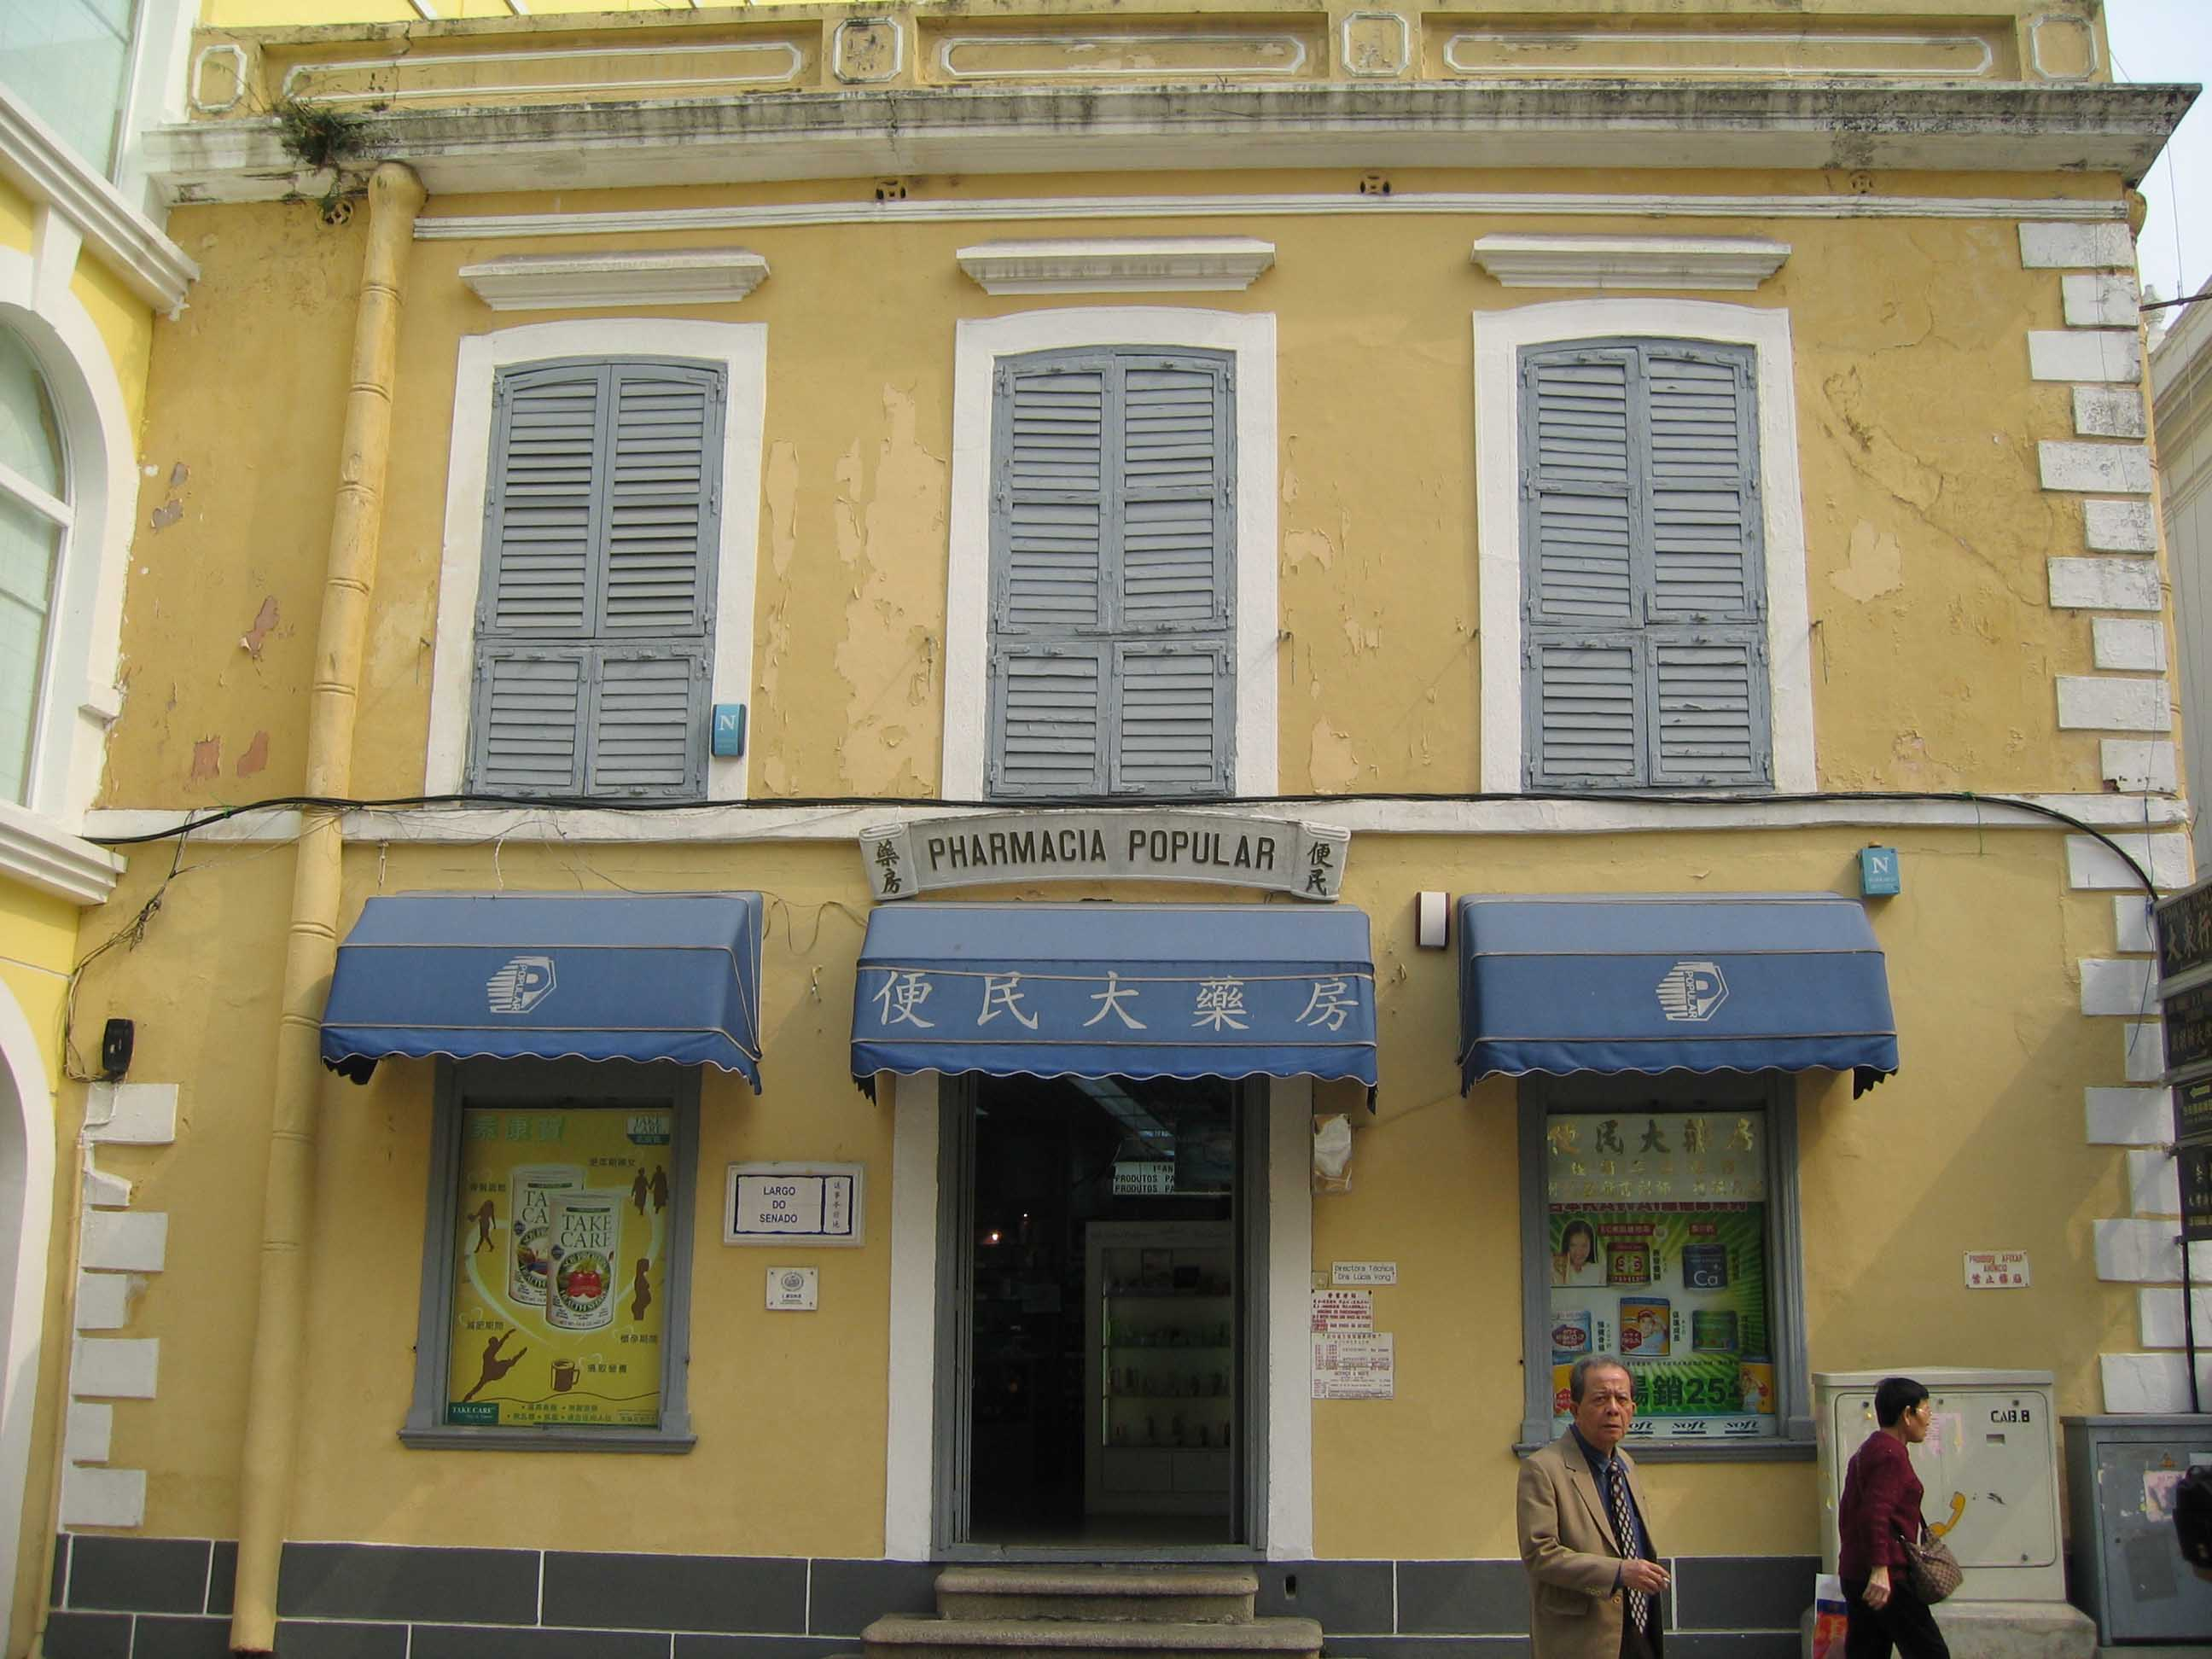 A Pharmacia Popular